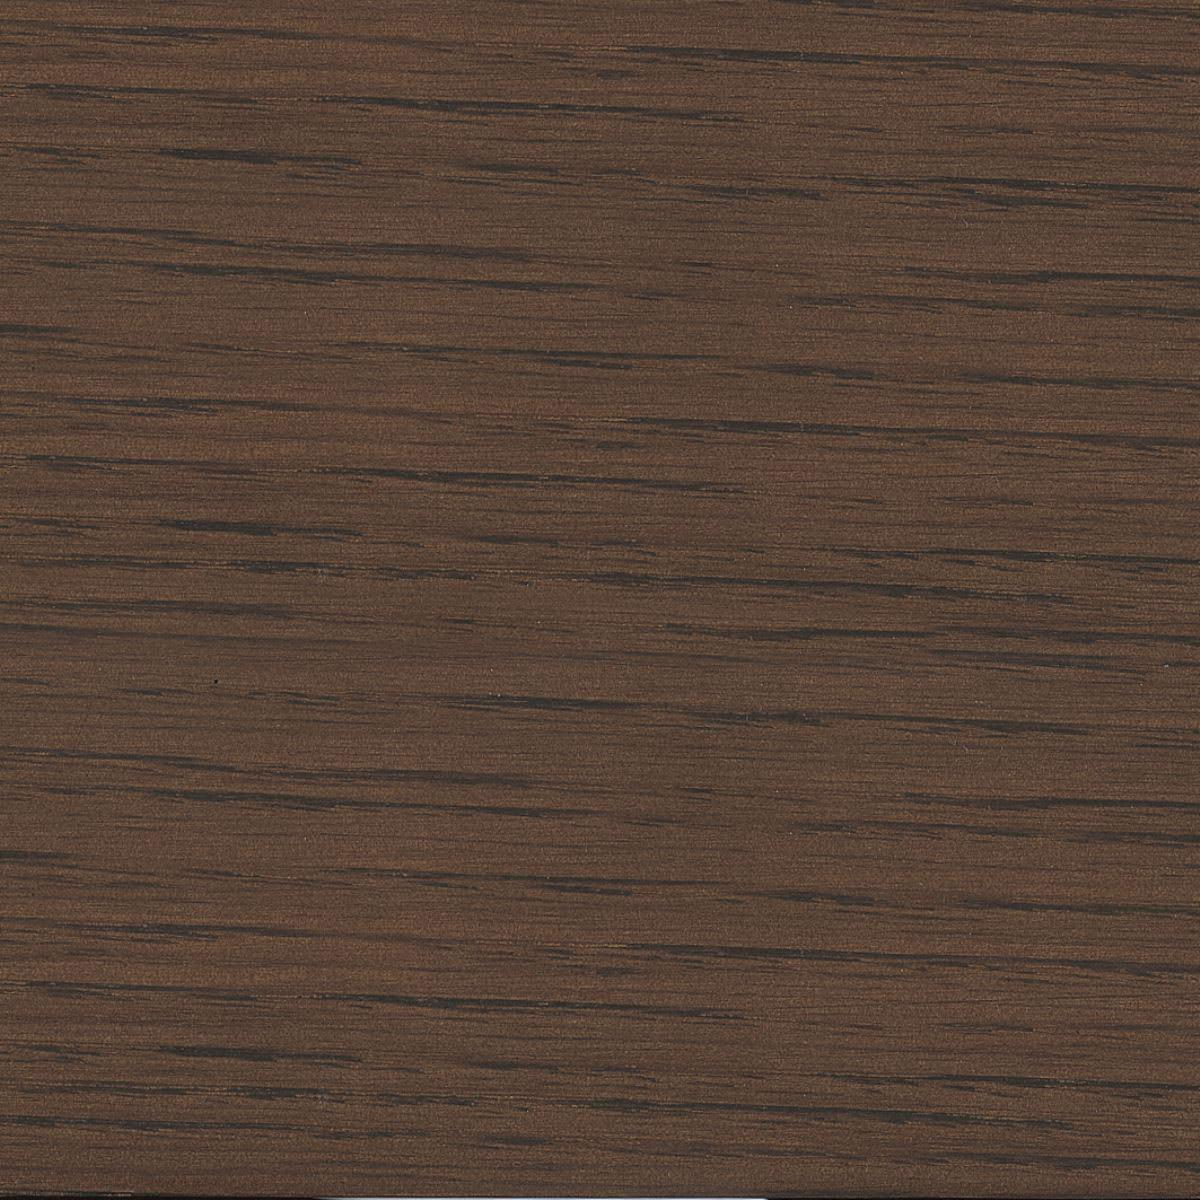 Ash wood in Moka stain